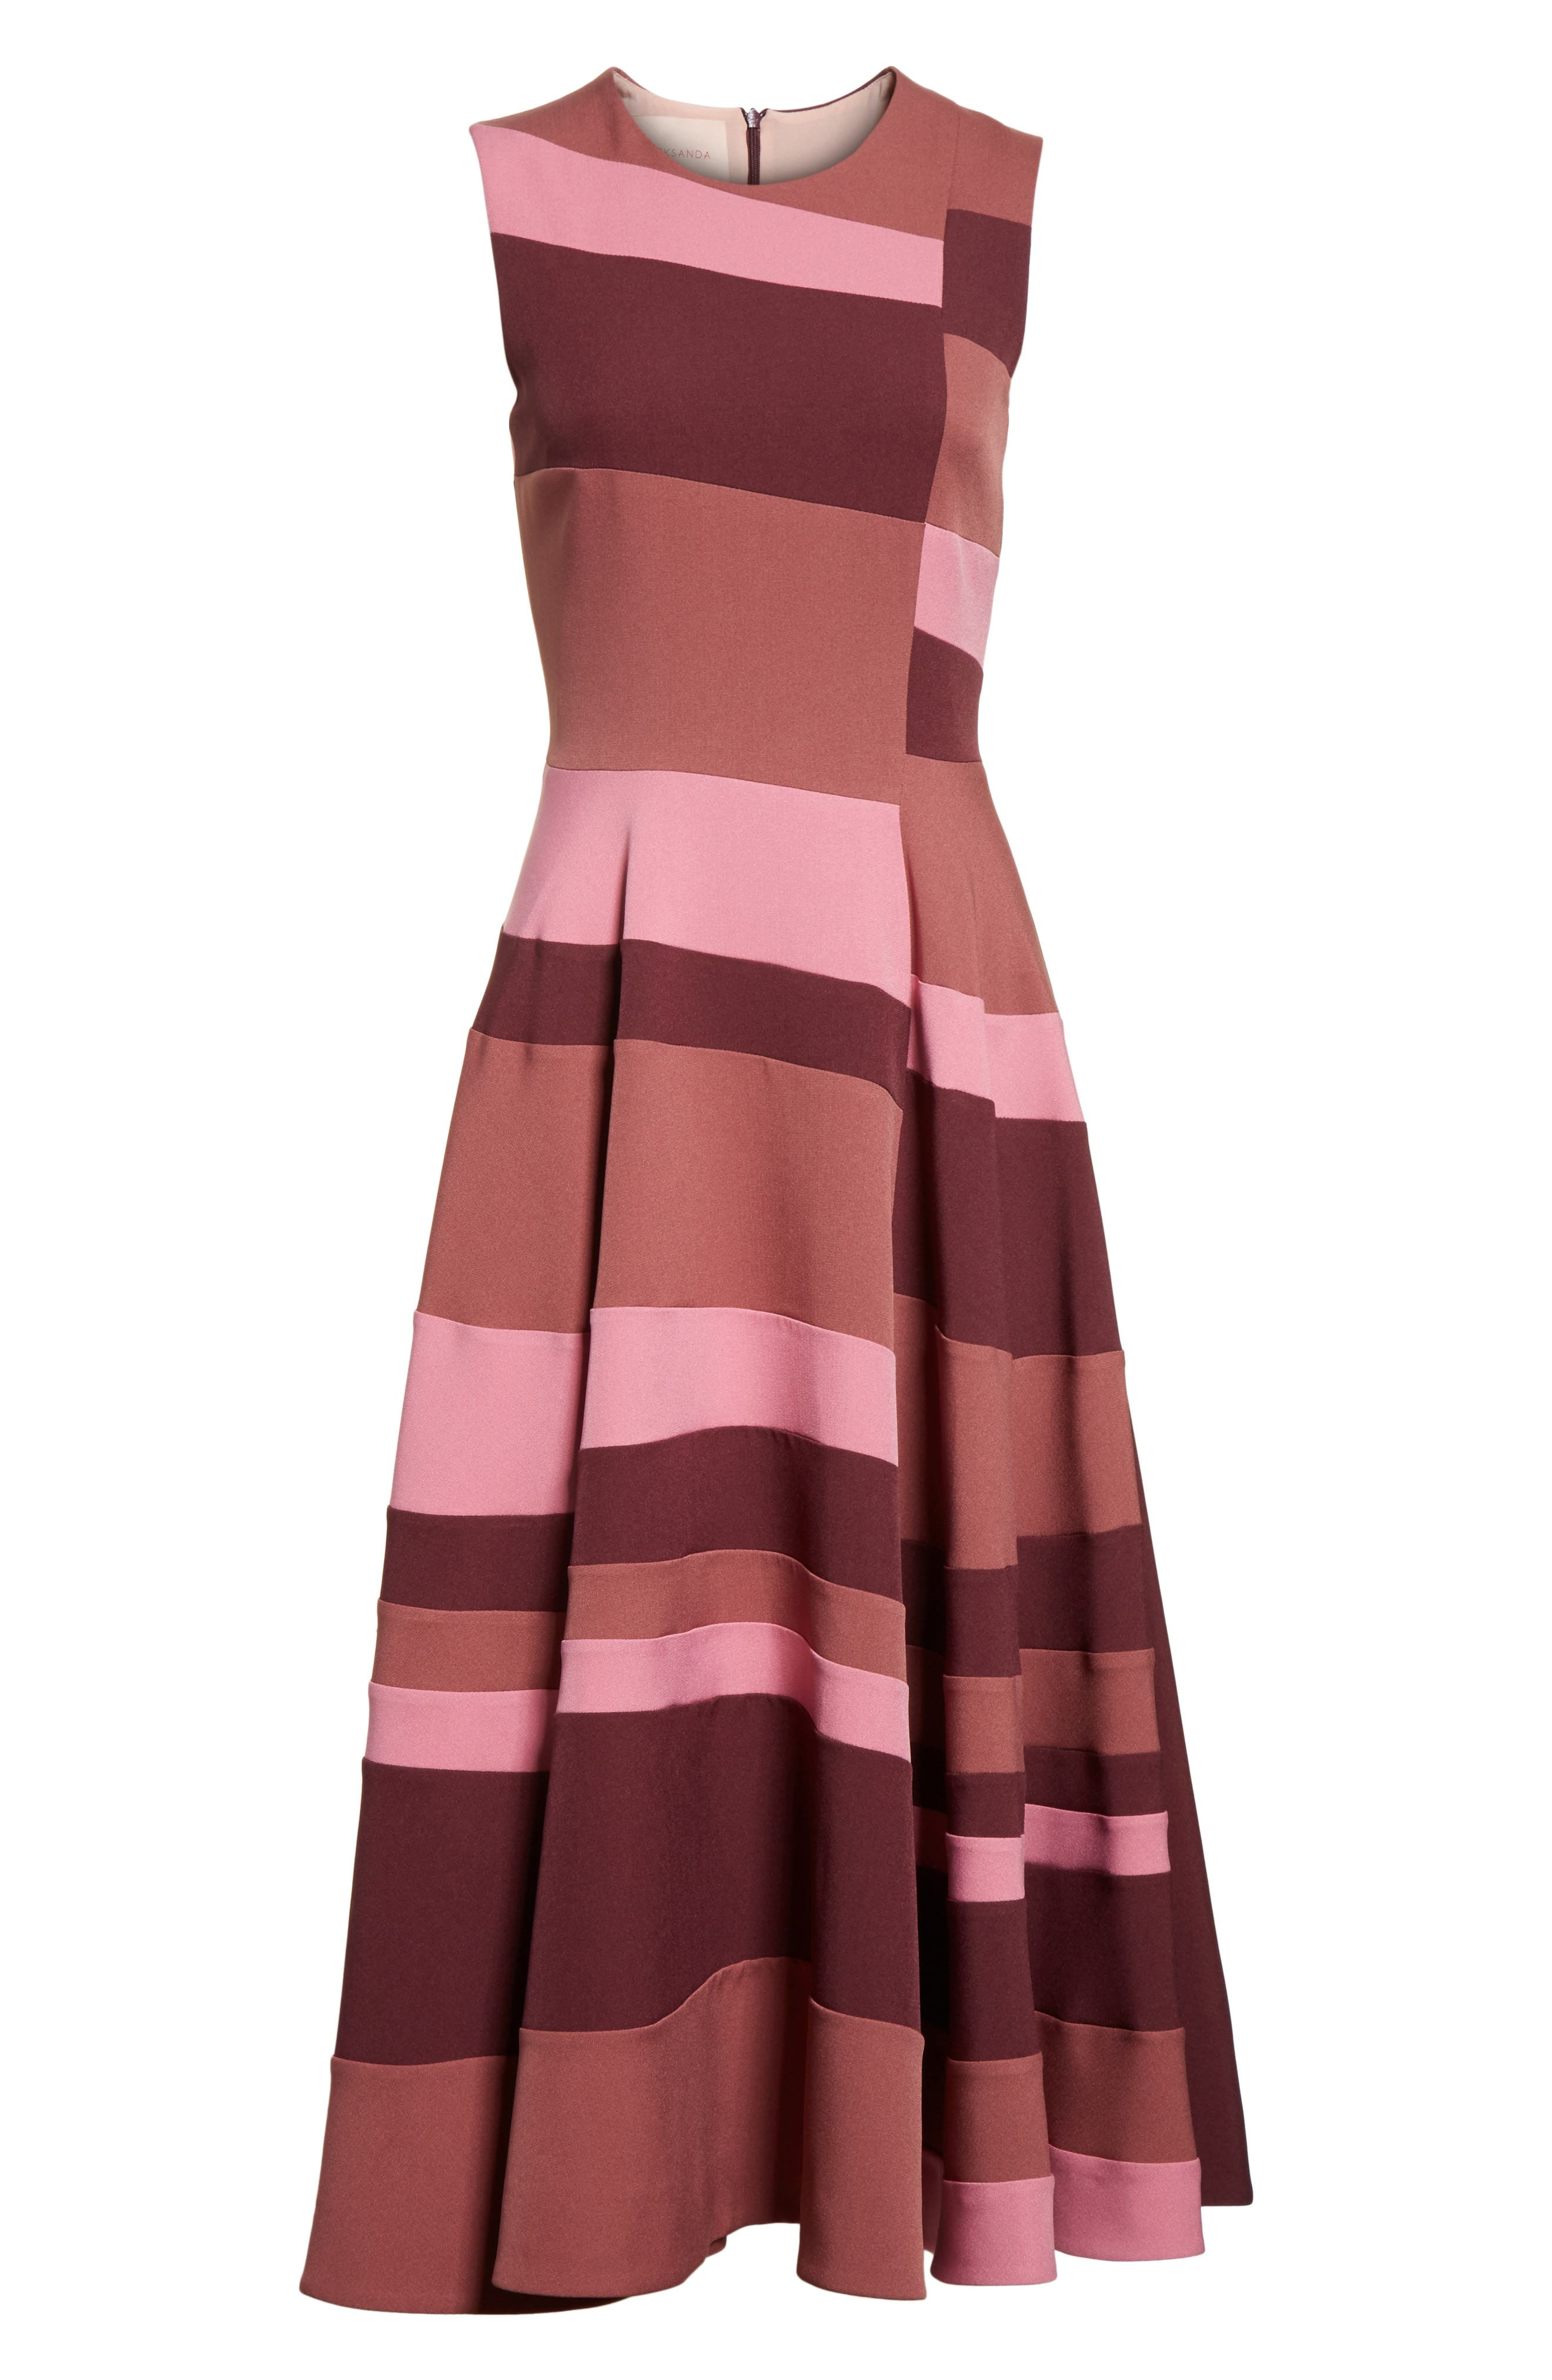 Tatum Stripe Paneled Fit & Flare Dress,                             Alternate thumbnail 7, color,                             Plum/ Blossom/ Mink